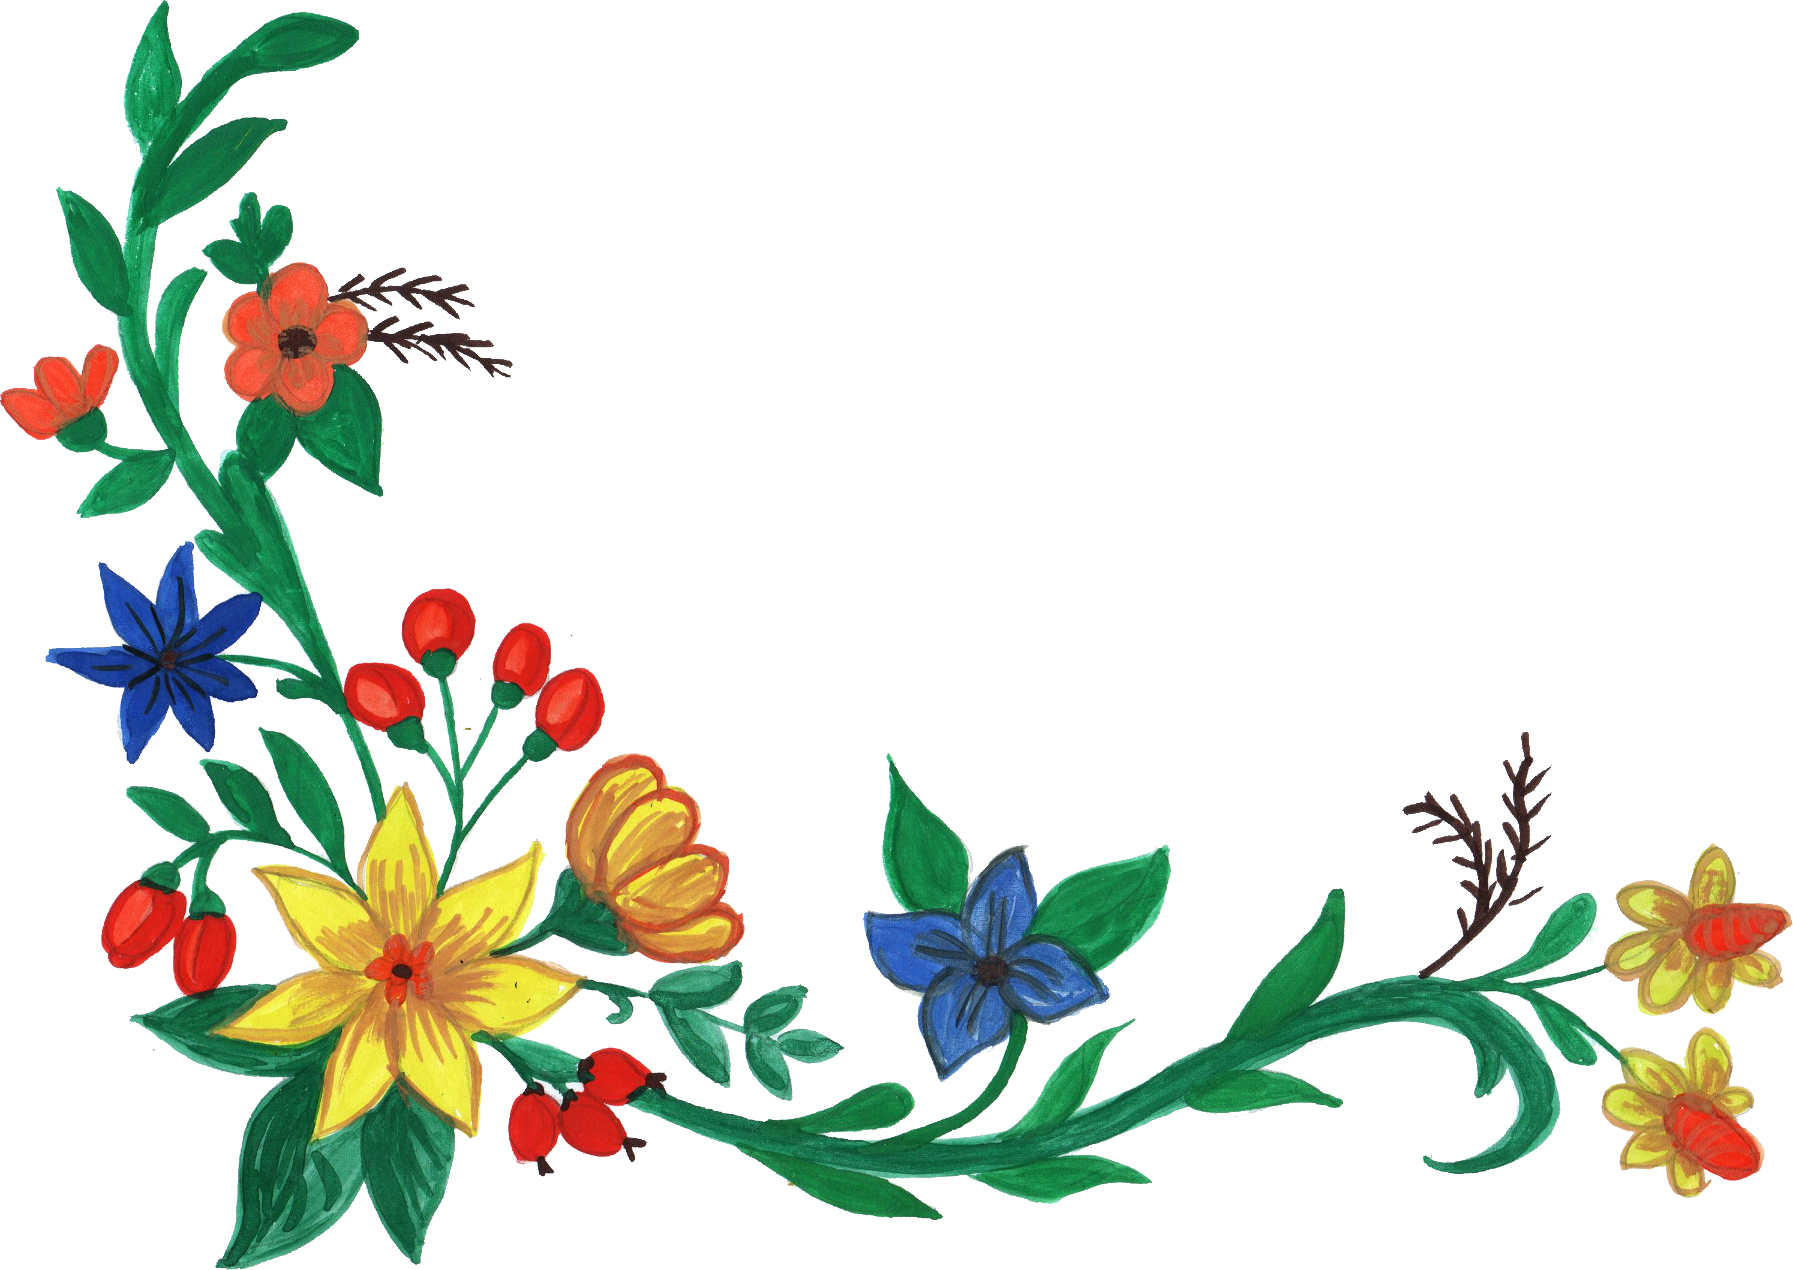 5 Watercolor Flower Corner PNG Transparent Vol 2